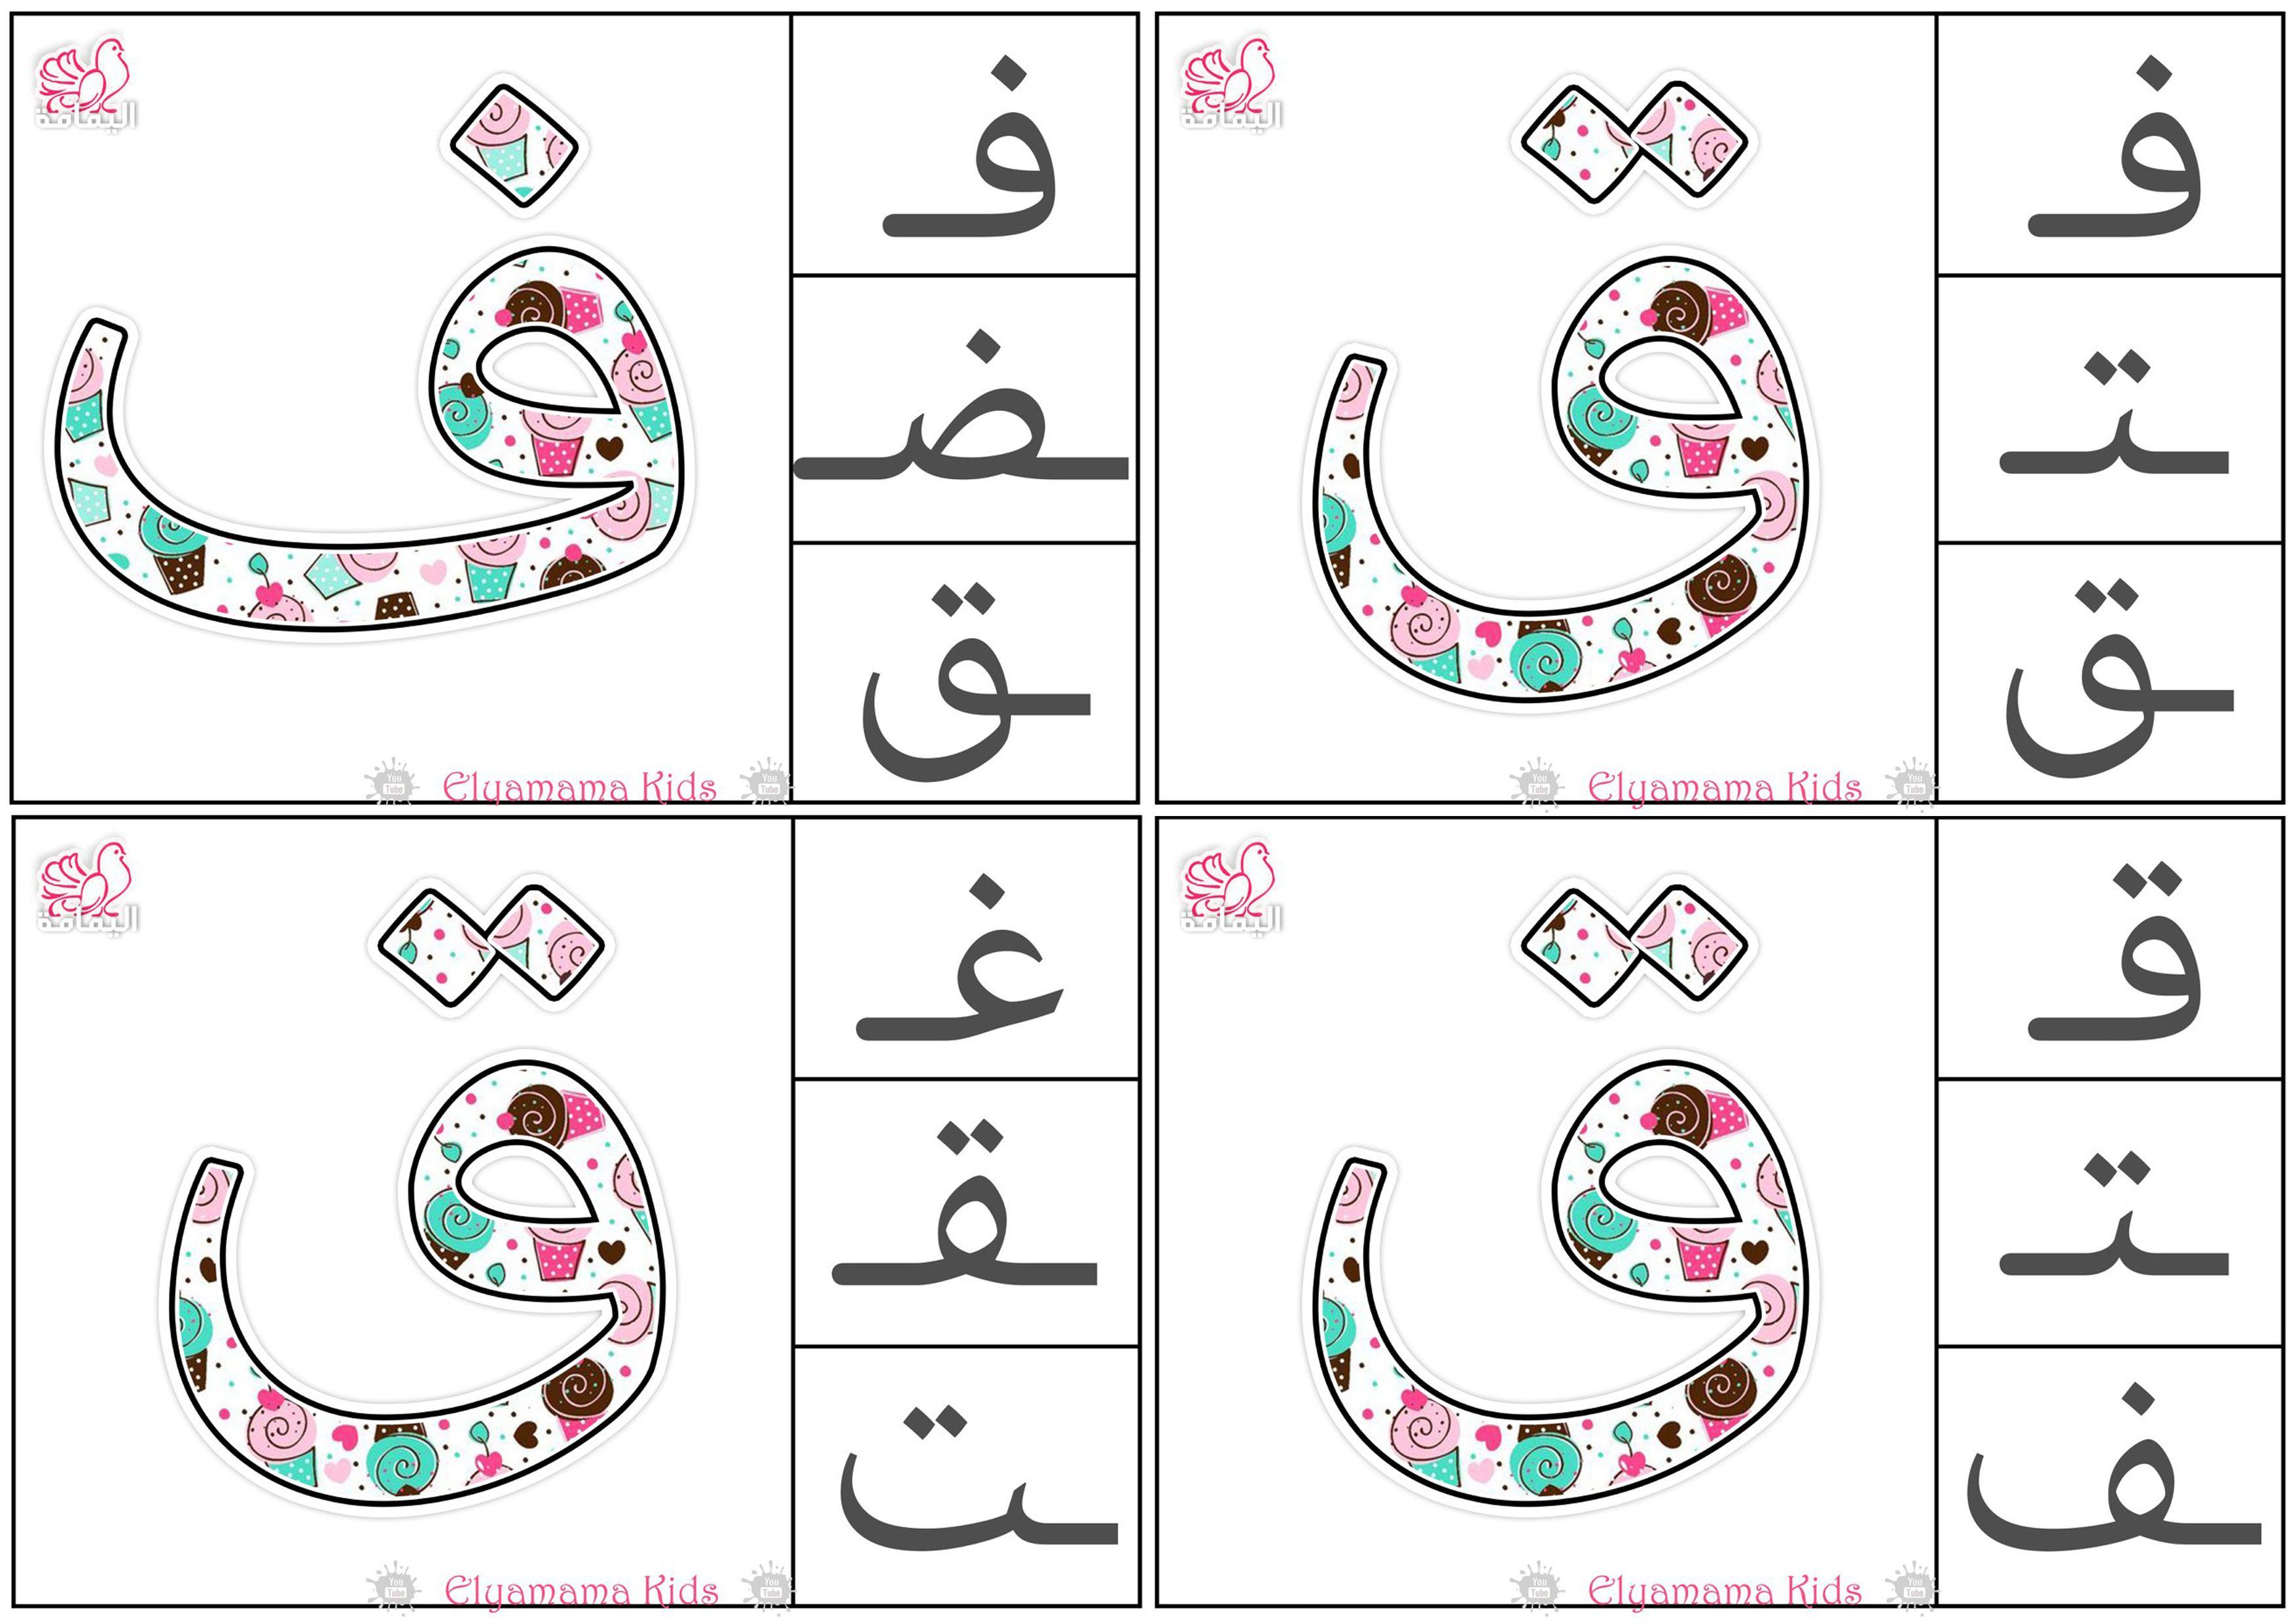 Pin By Merve Unal On أوراق خاصة بفيديو اليوتيوب Arabic Alphabet Teach Arabic Alphabet